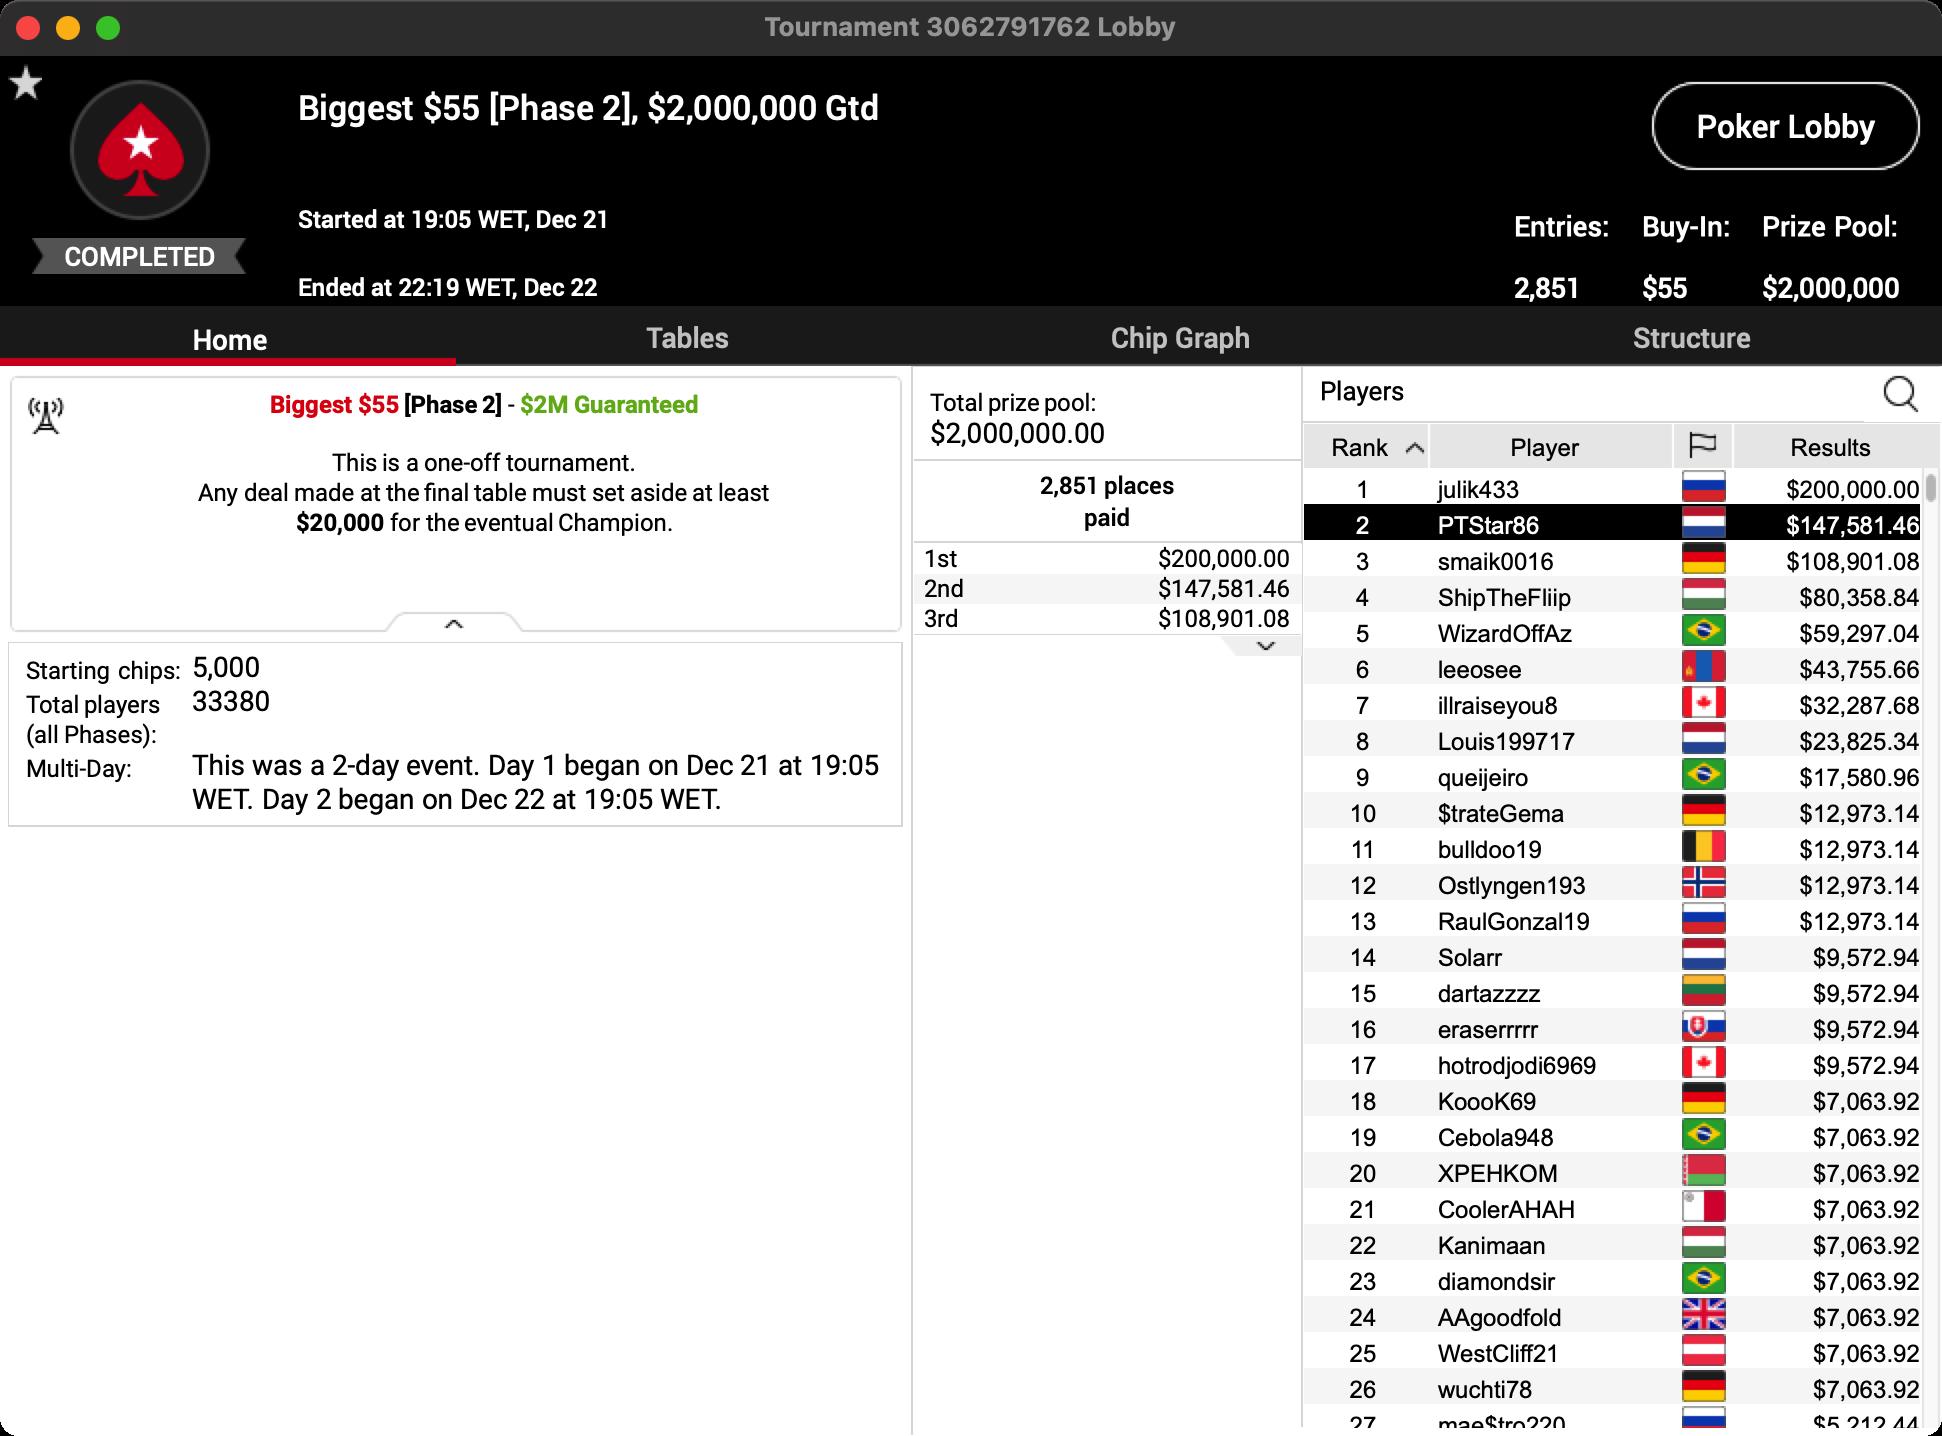 pokerstars biggest 55 ptstar86